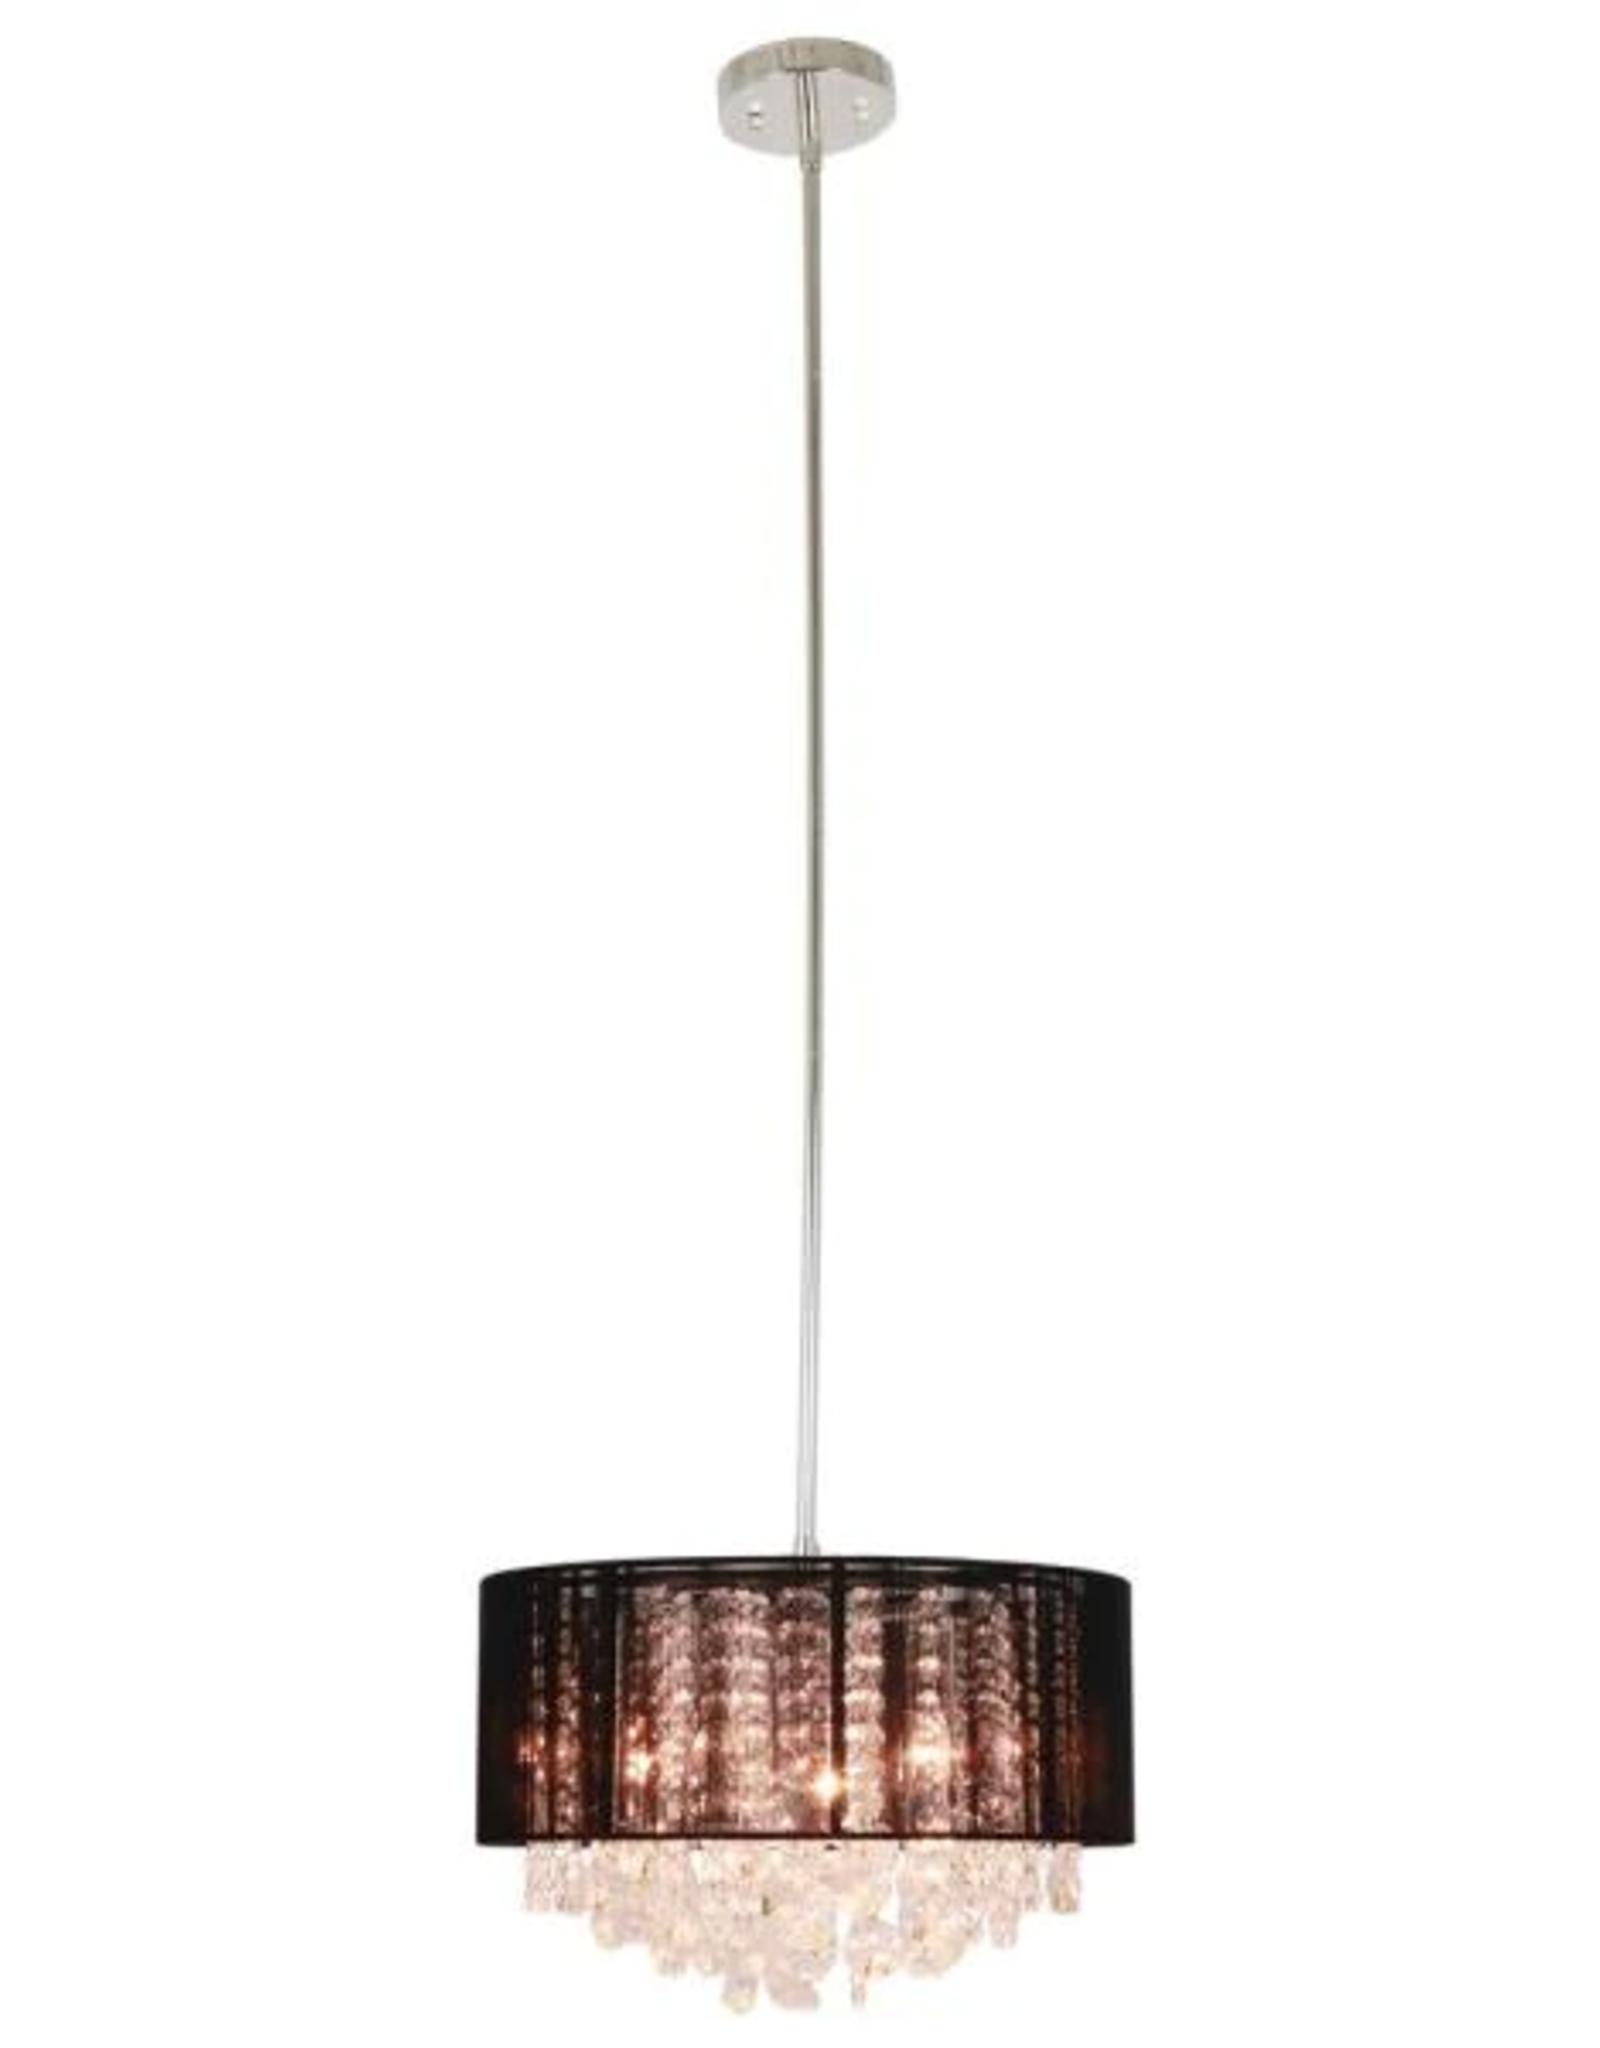 Decor Therapy Serra 1-Light Polished Nickel Black String Beaded Pendant